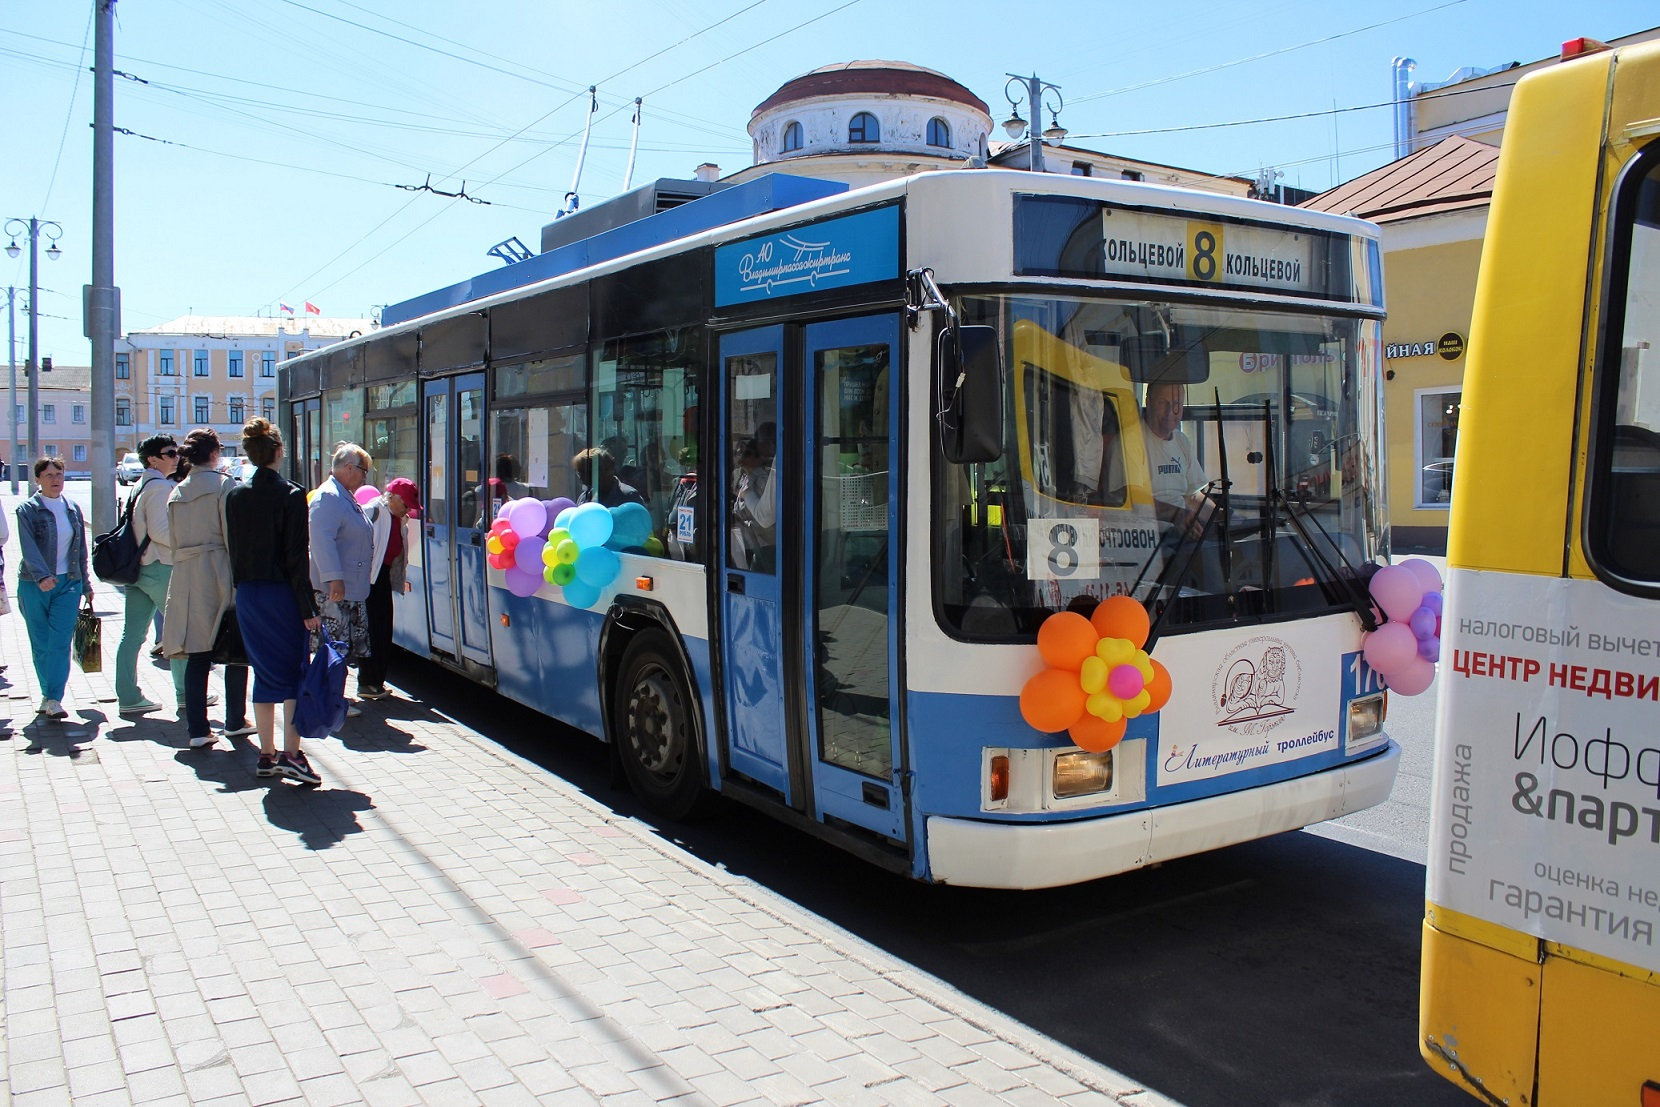 Literaturnyi trolleybus 1